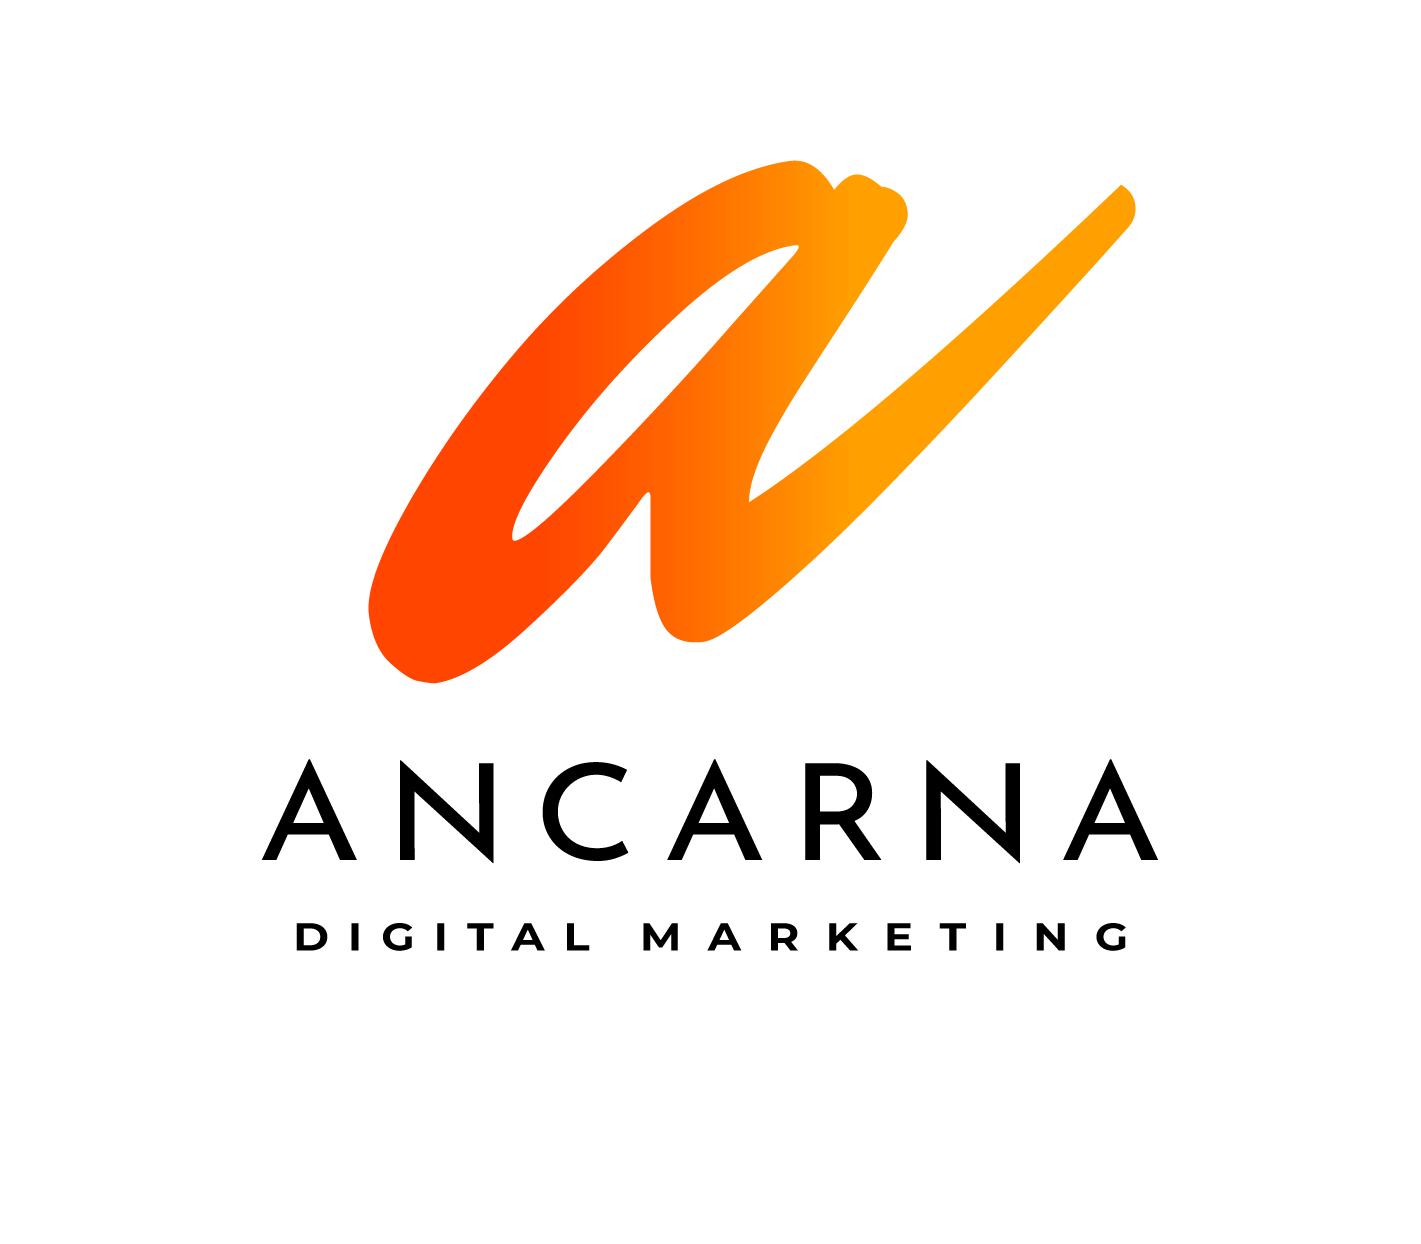 Ancarna Digital